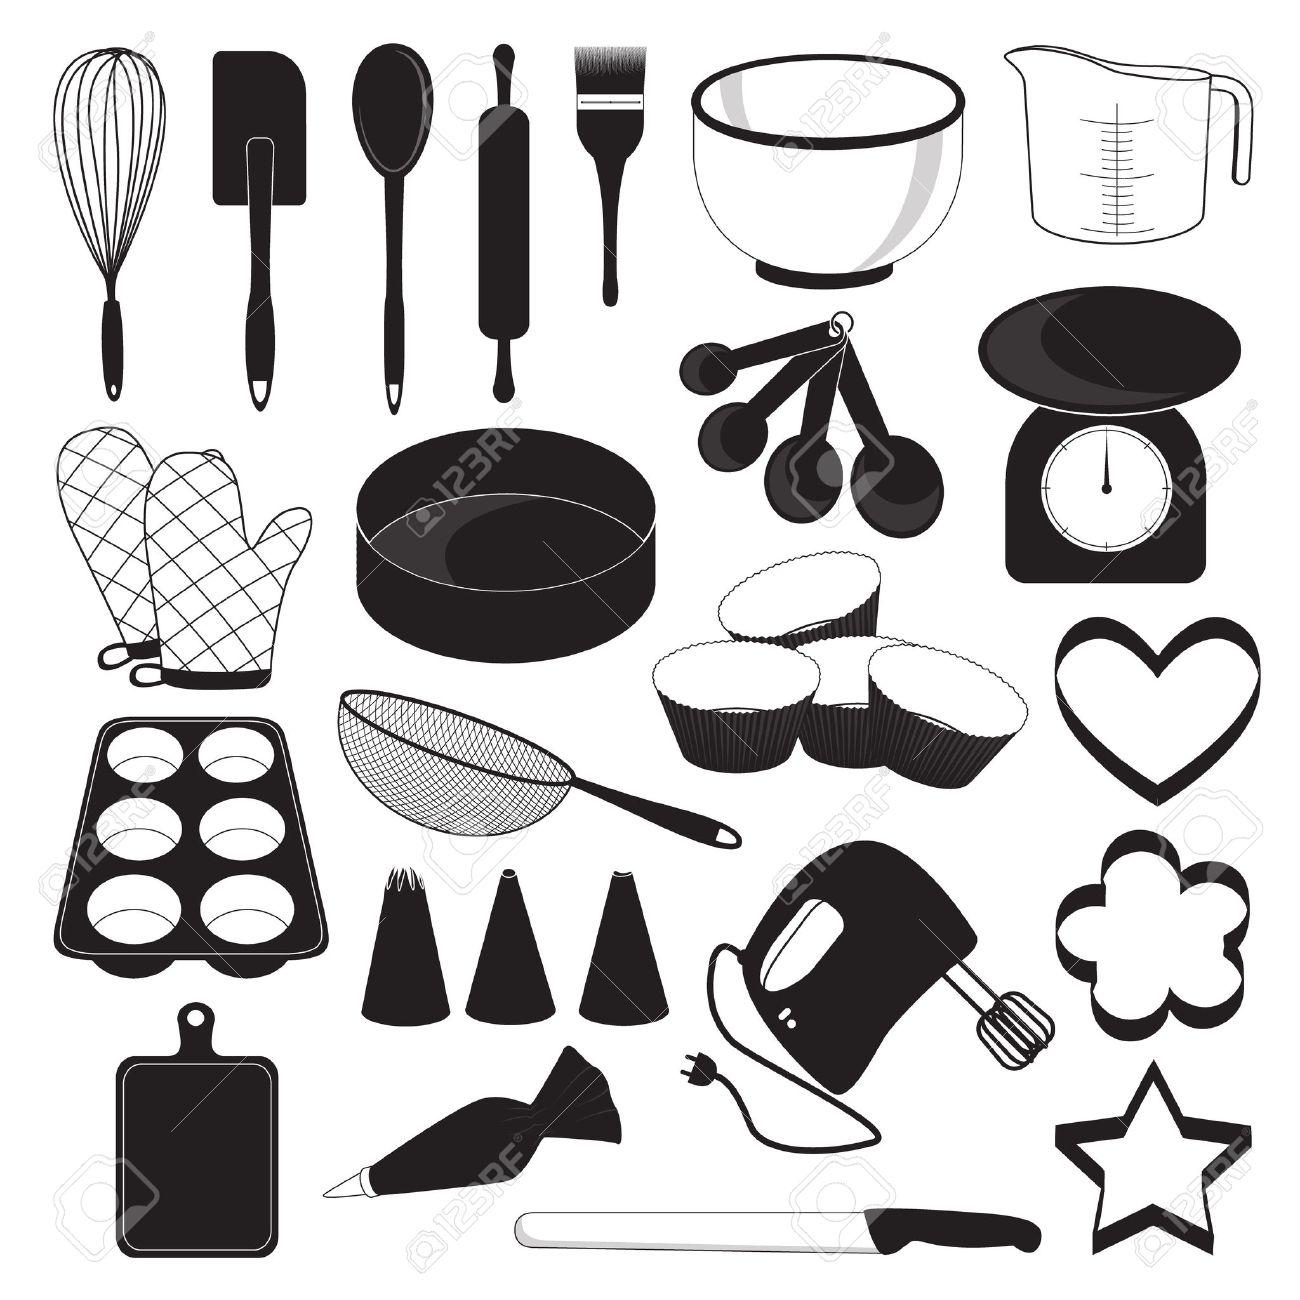 Baking Tools Vector Baking Tool Icons Set Royalty Free Cliparts Vectors And Stock